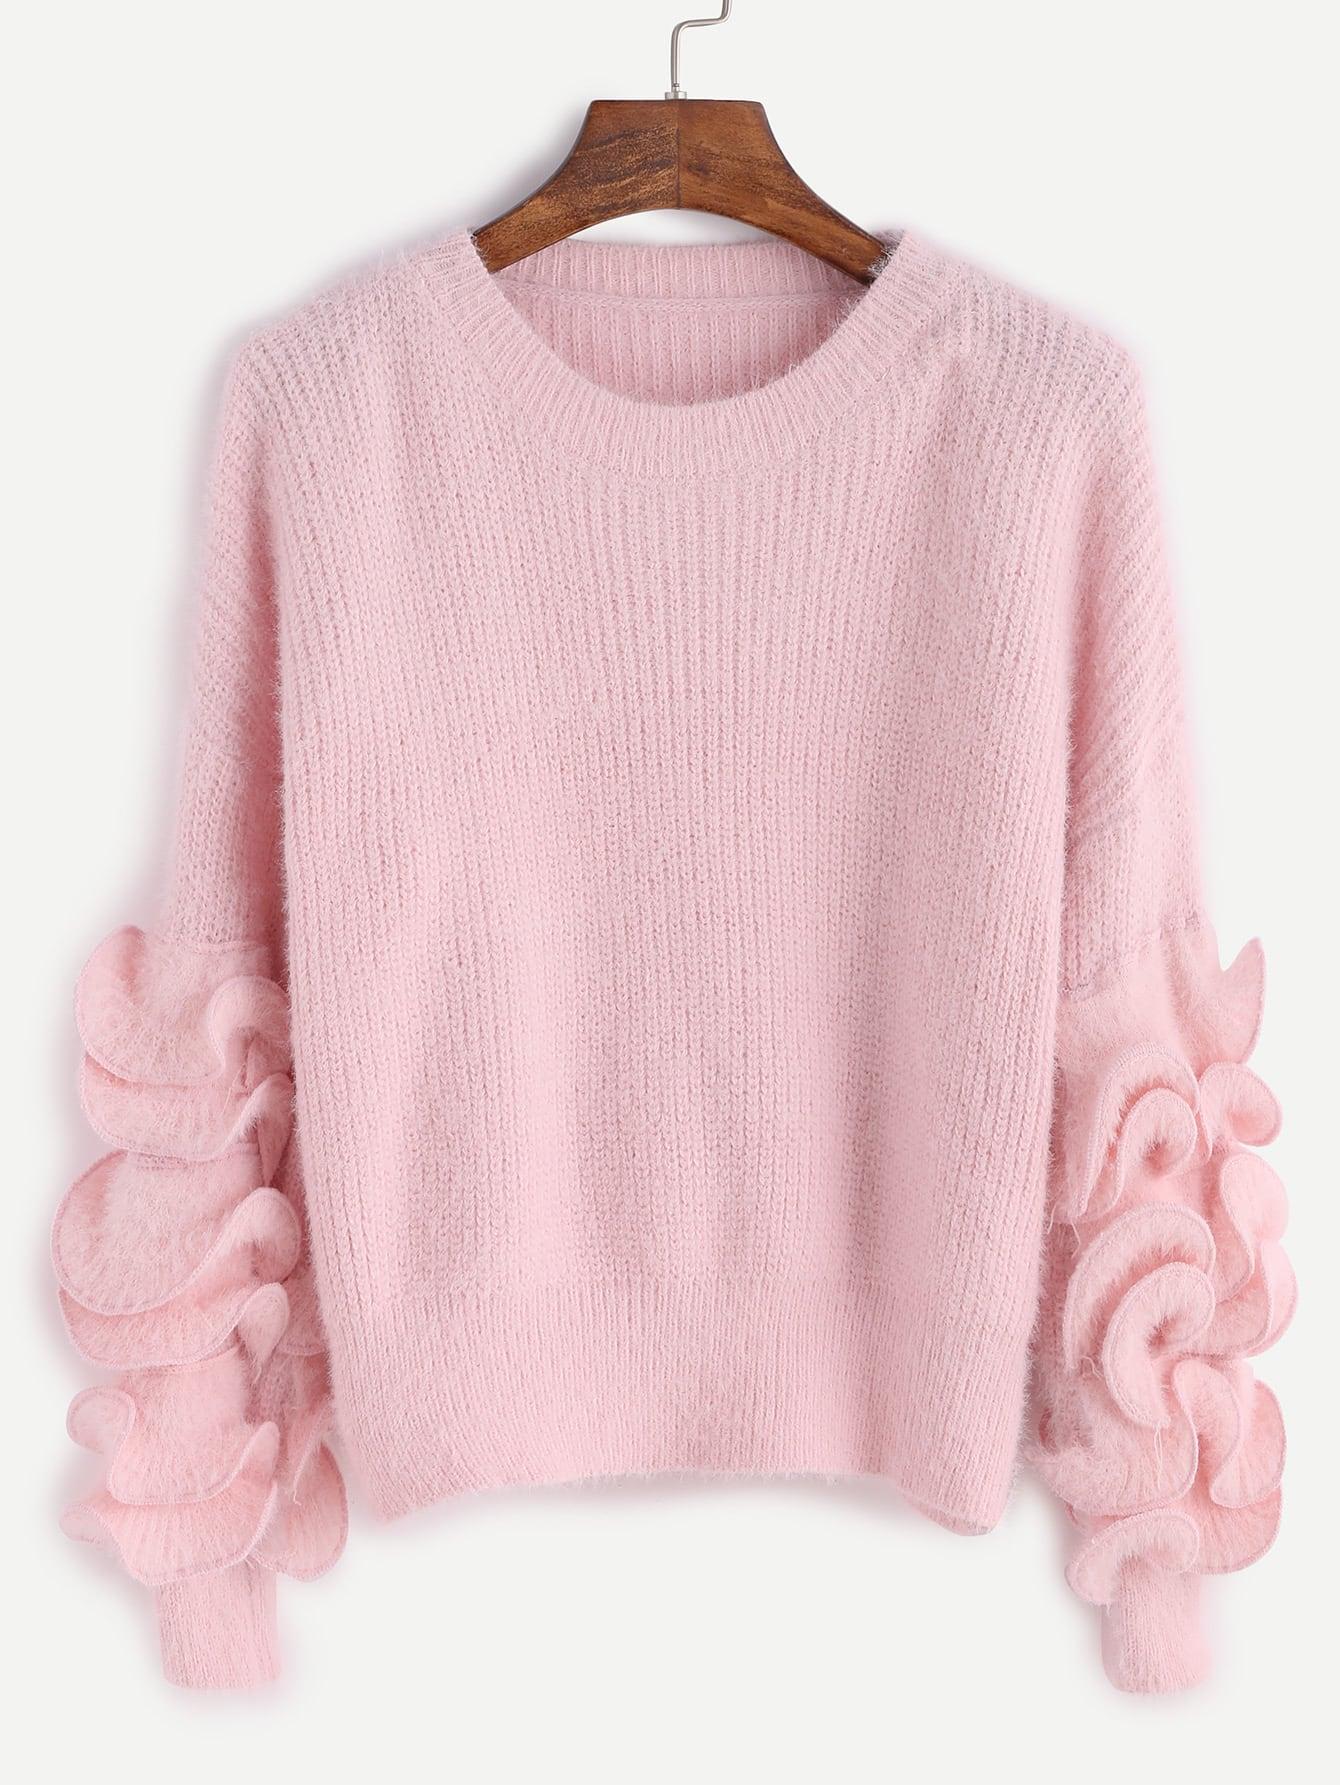 Pink Drop Shoulder Ruffle Trim Fuzzy Sweater sweater161017105